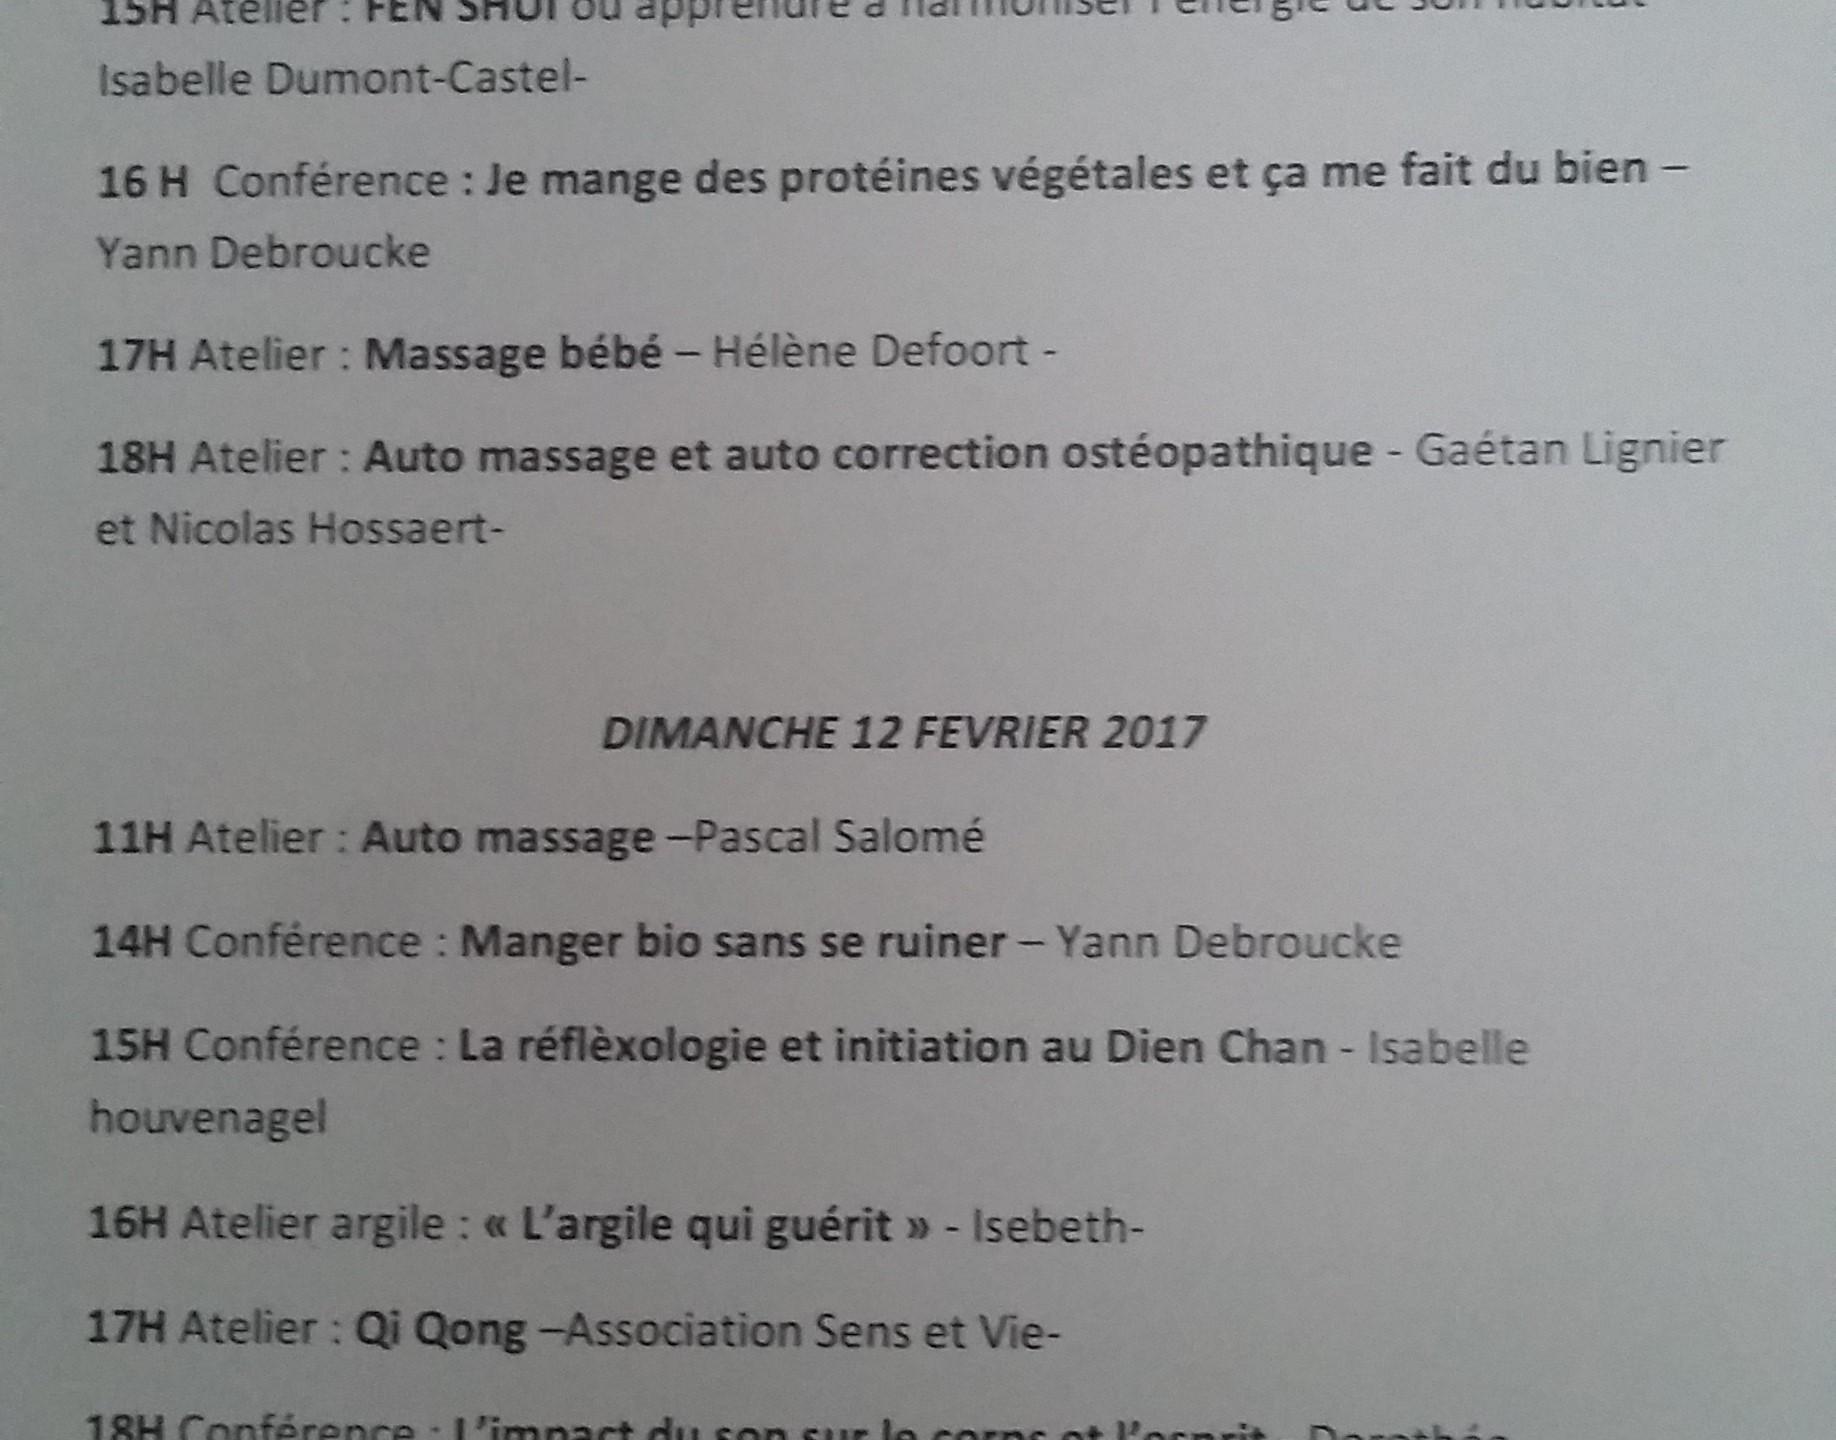 programme stenbecque